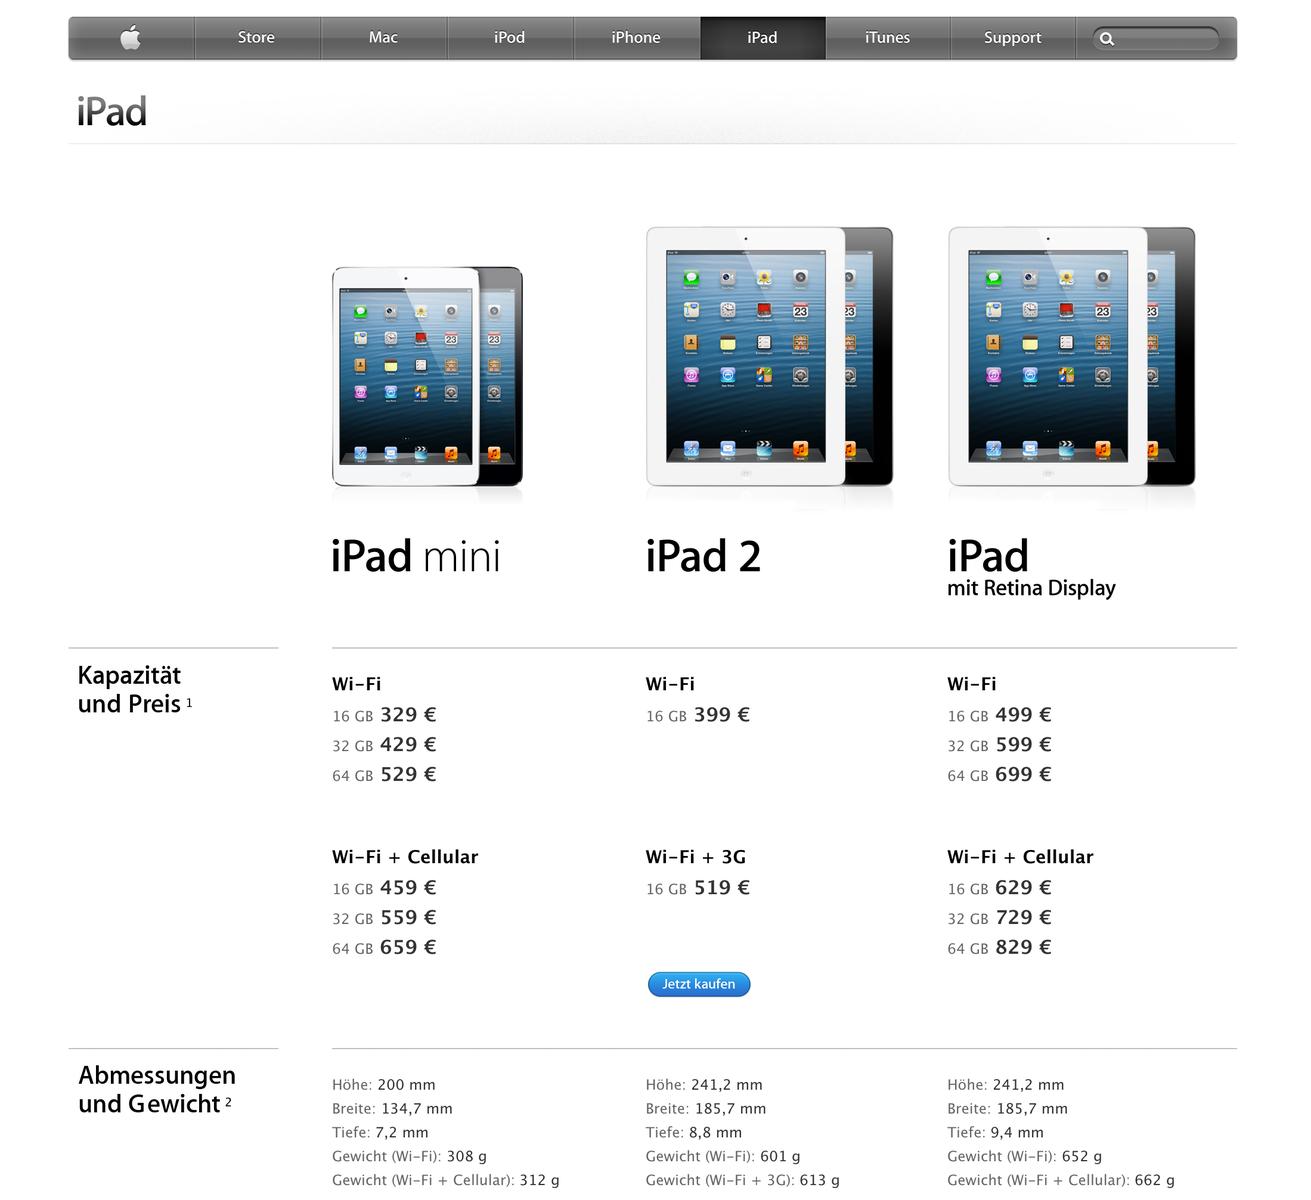 apple ipad mini mit 7 9 zoll bildschirm und a5 dual core. Black Bedroom Furniture Sets. Home Design Ideas